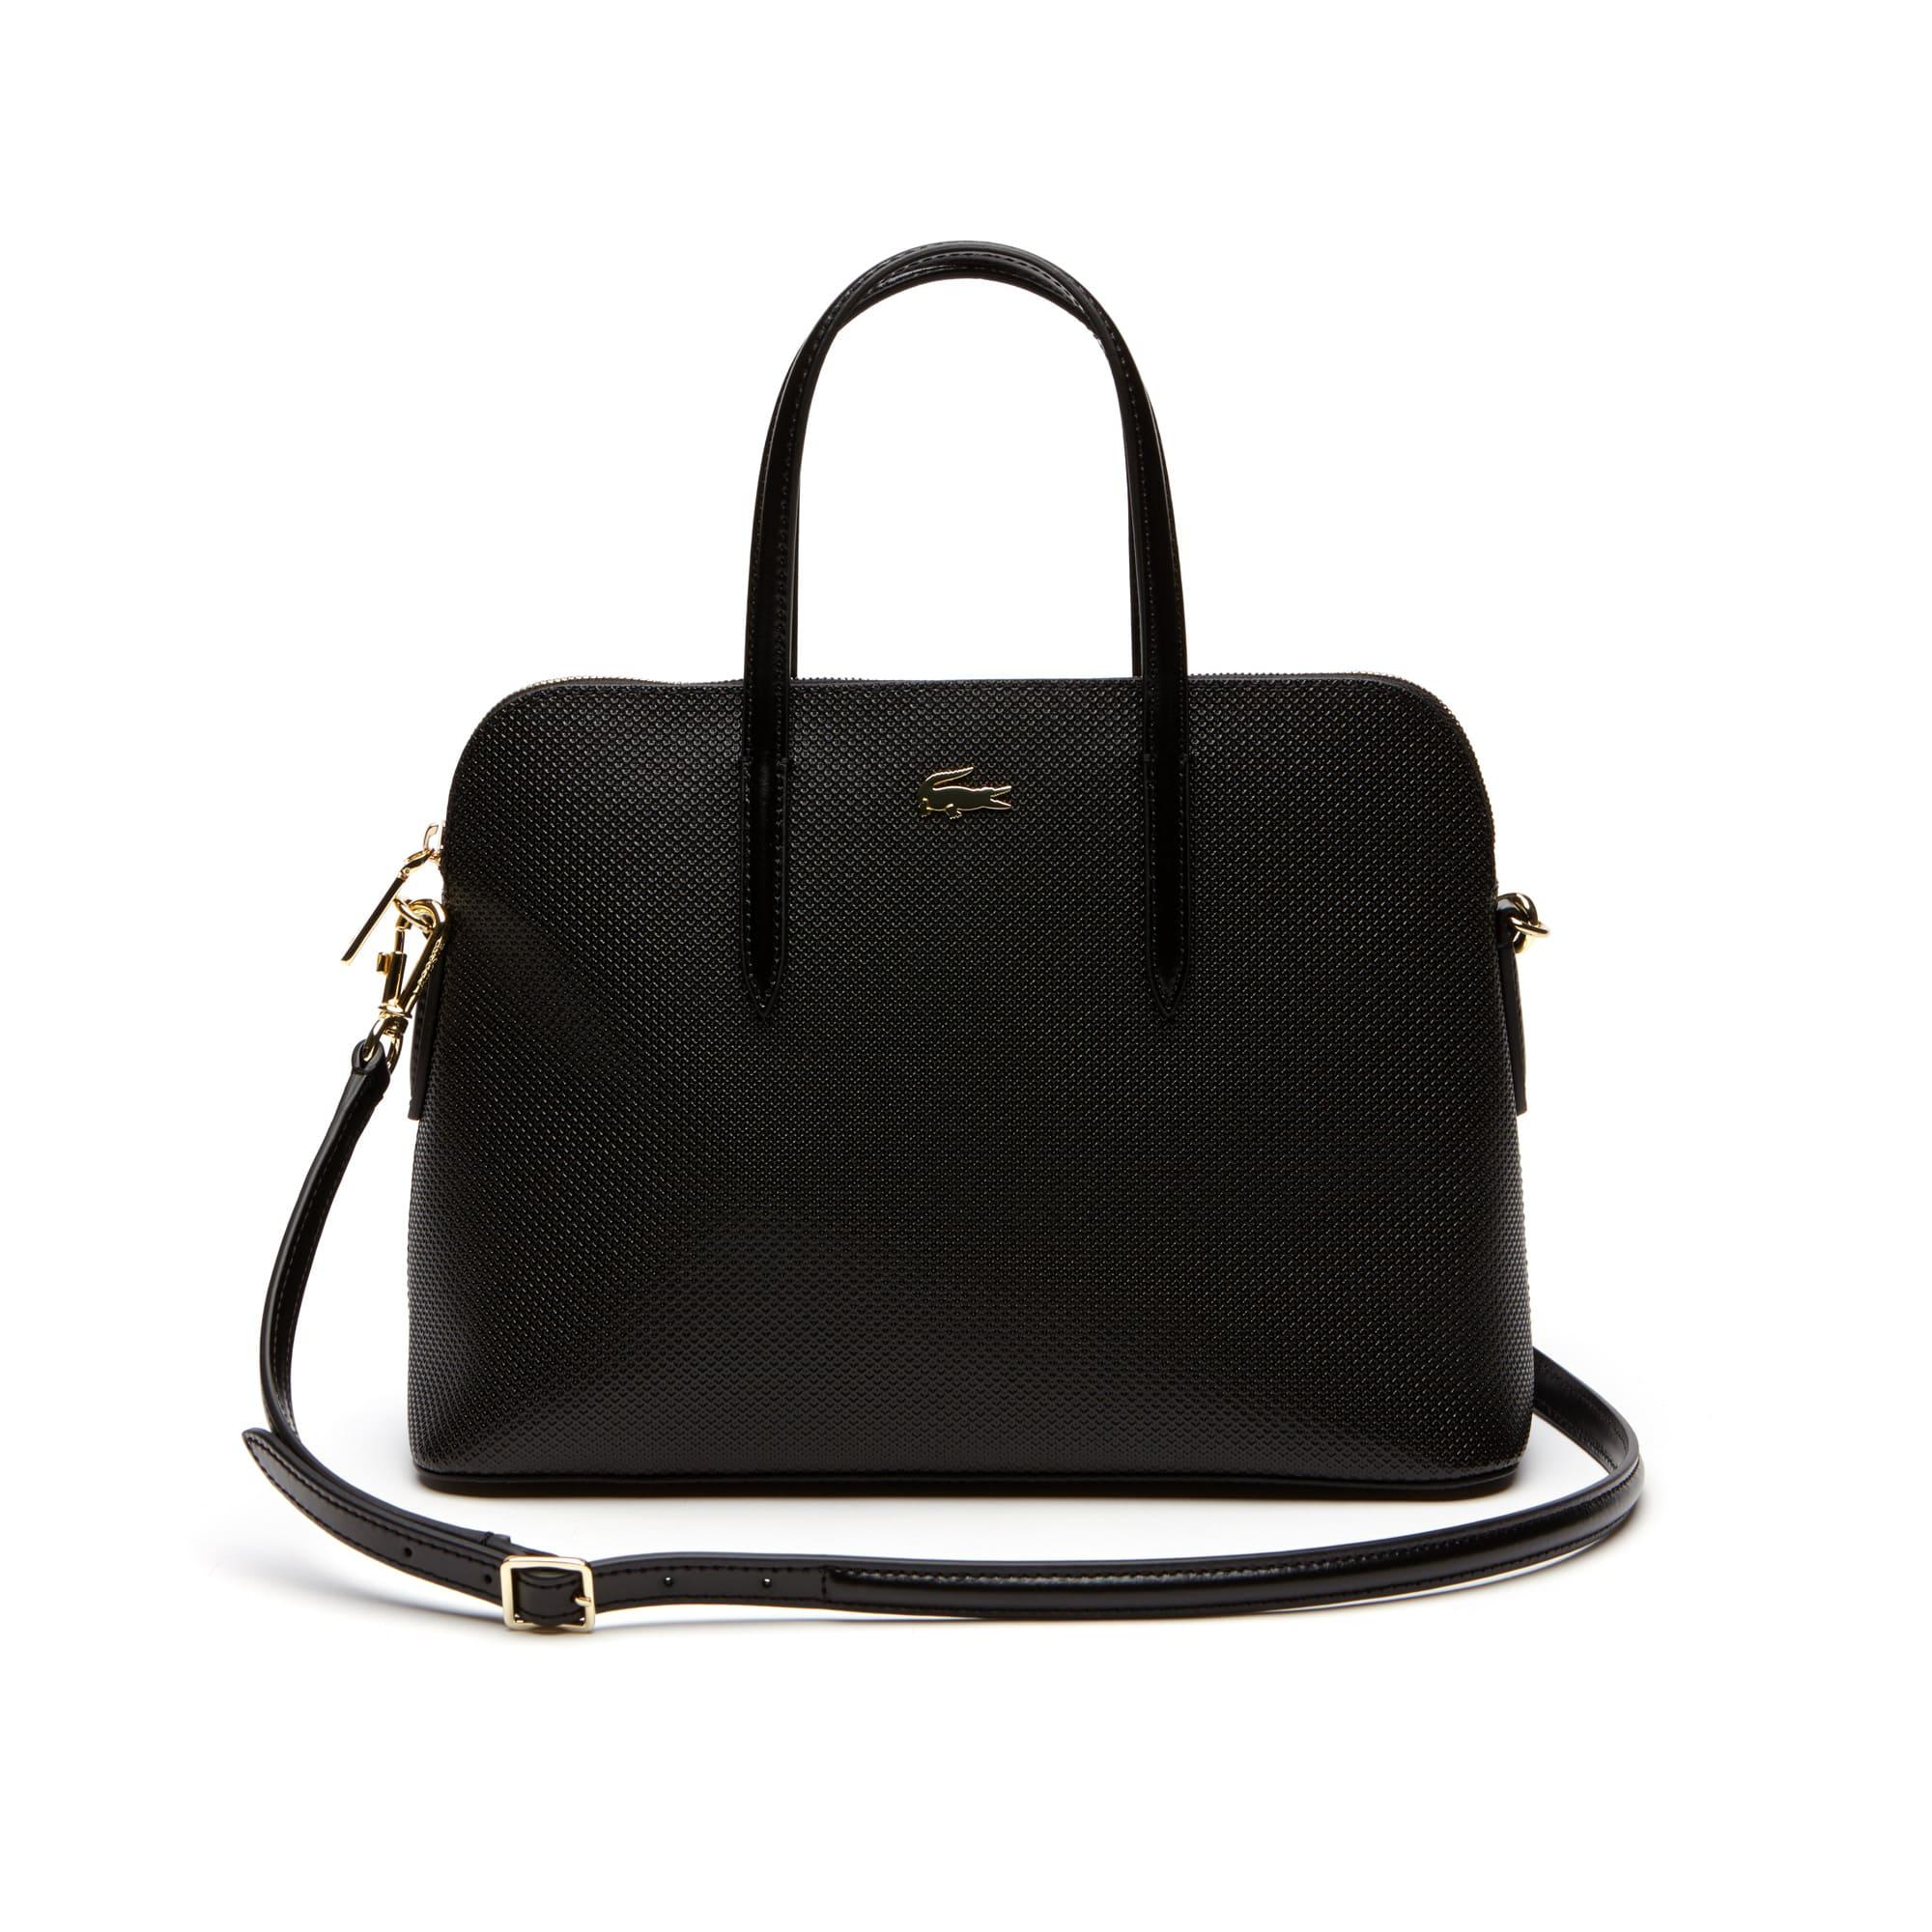 Women's Chantaco Dual Carry Piqué Leather Bugatti Bag